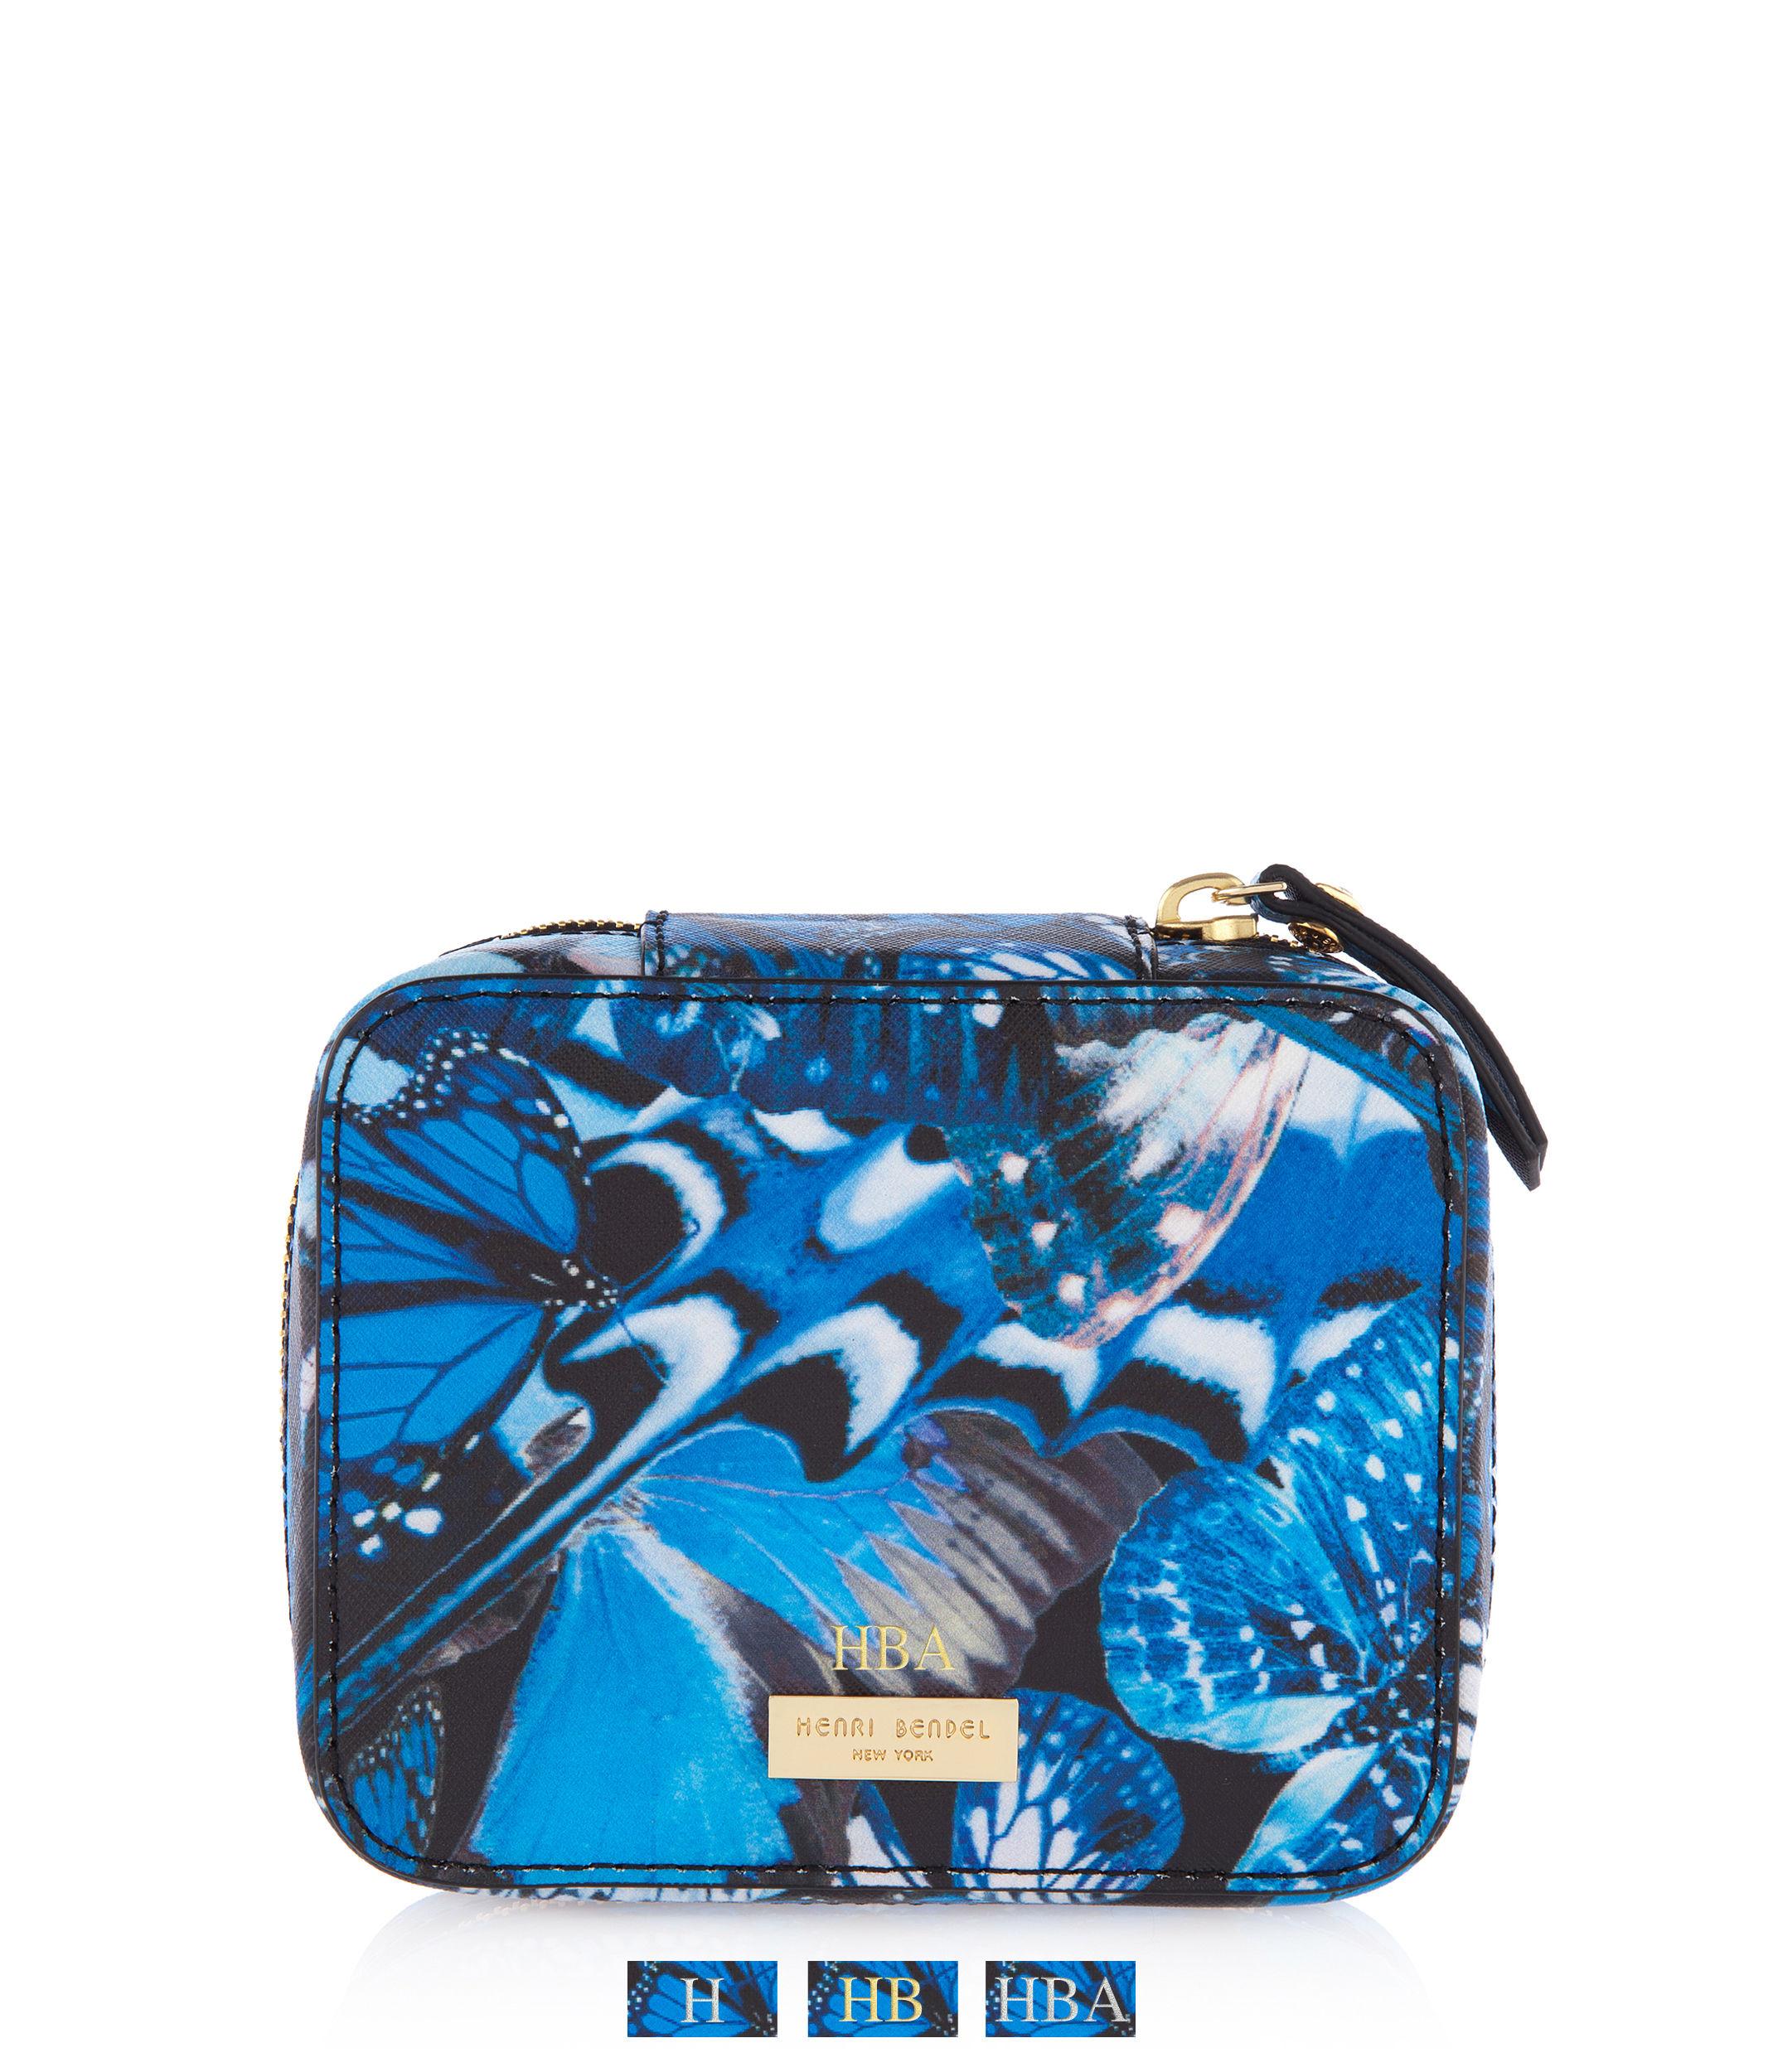 Henri bendel west 57th travel jewelry box in blue lyst for Tj maxx jewelry box